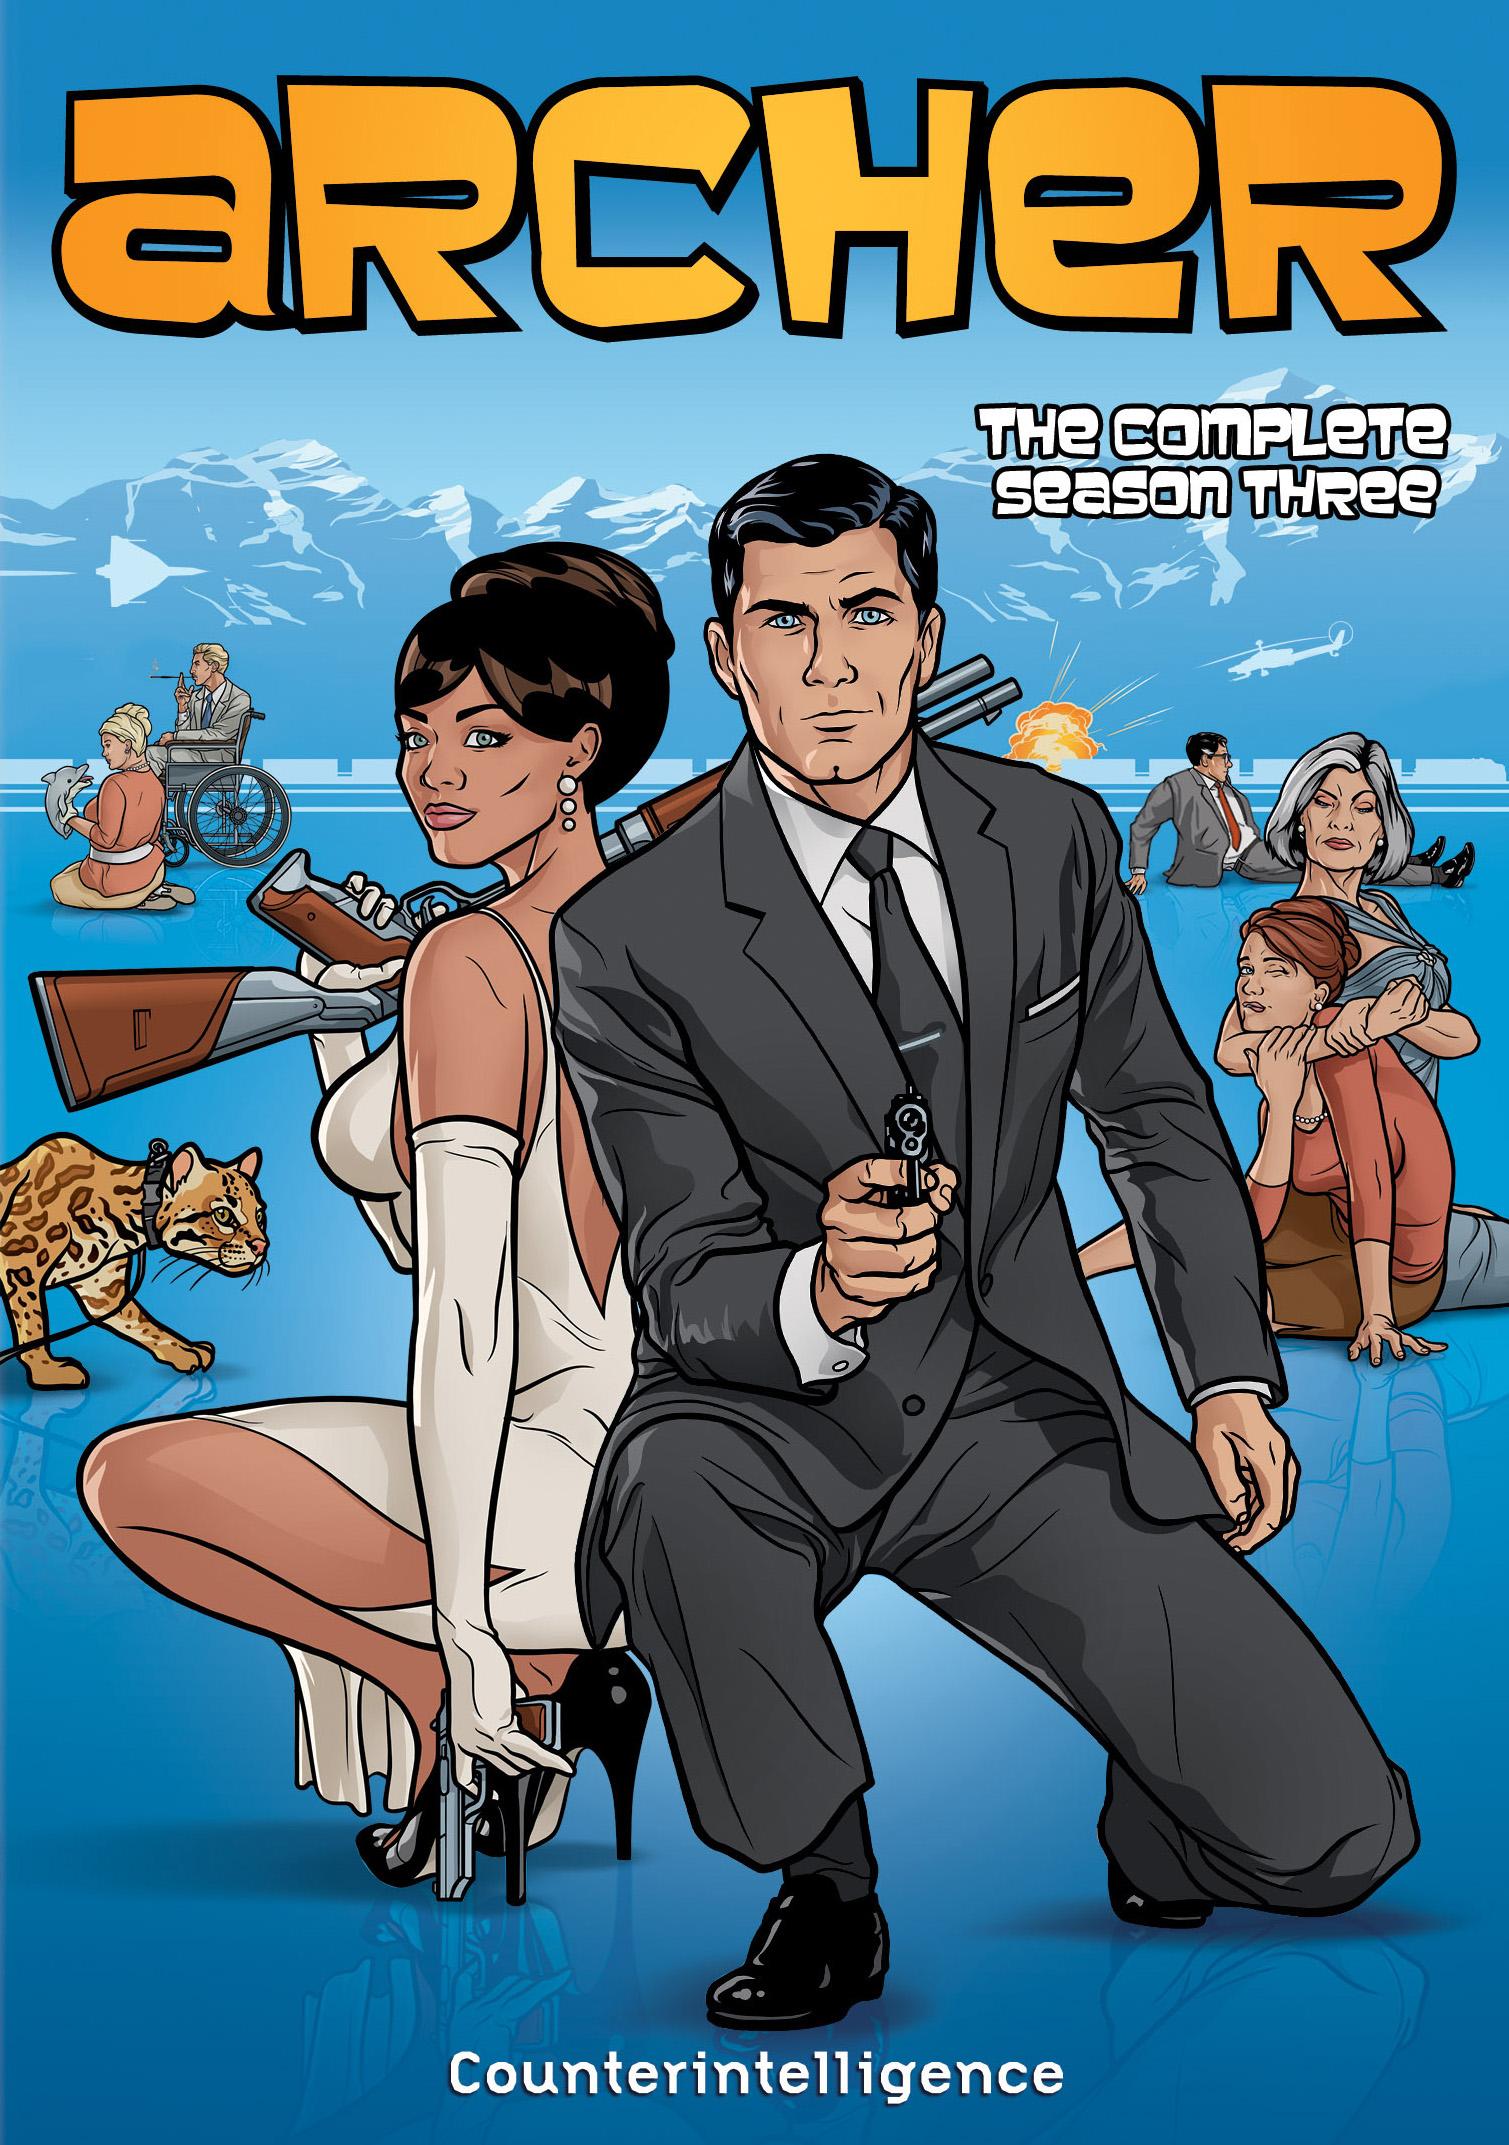 Archer: The Complete Season Three [2 Discs] (dvd) 7120086